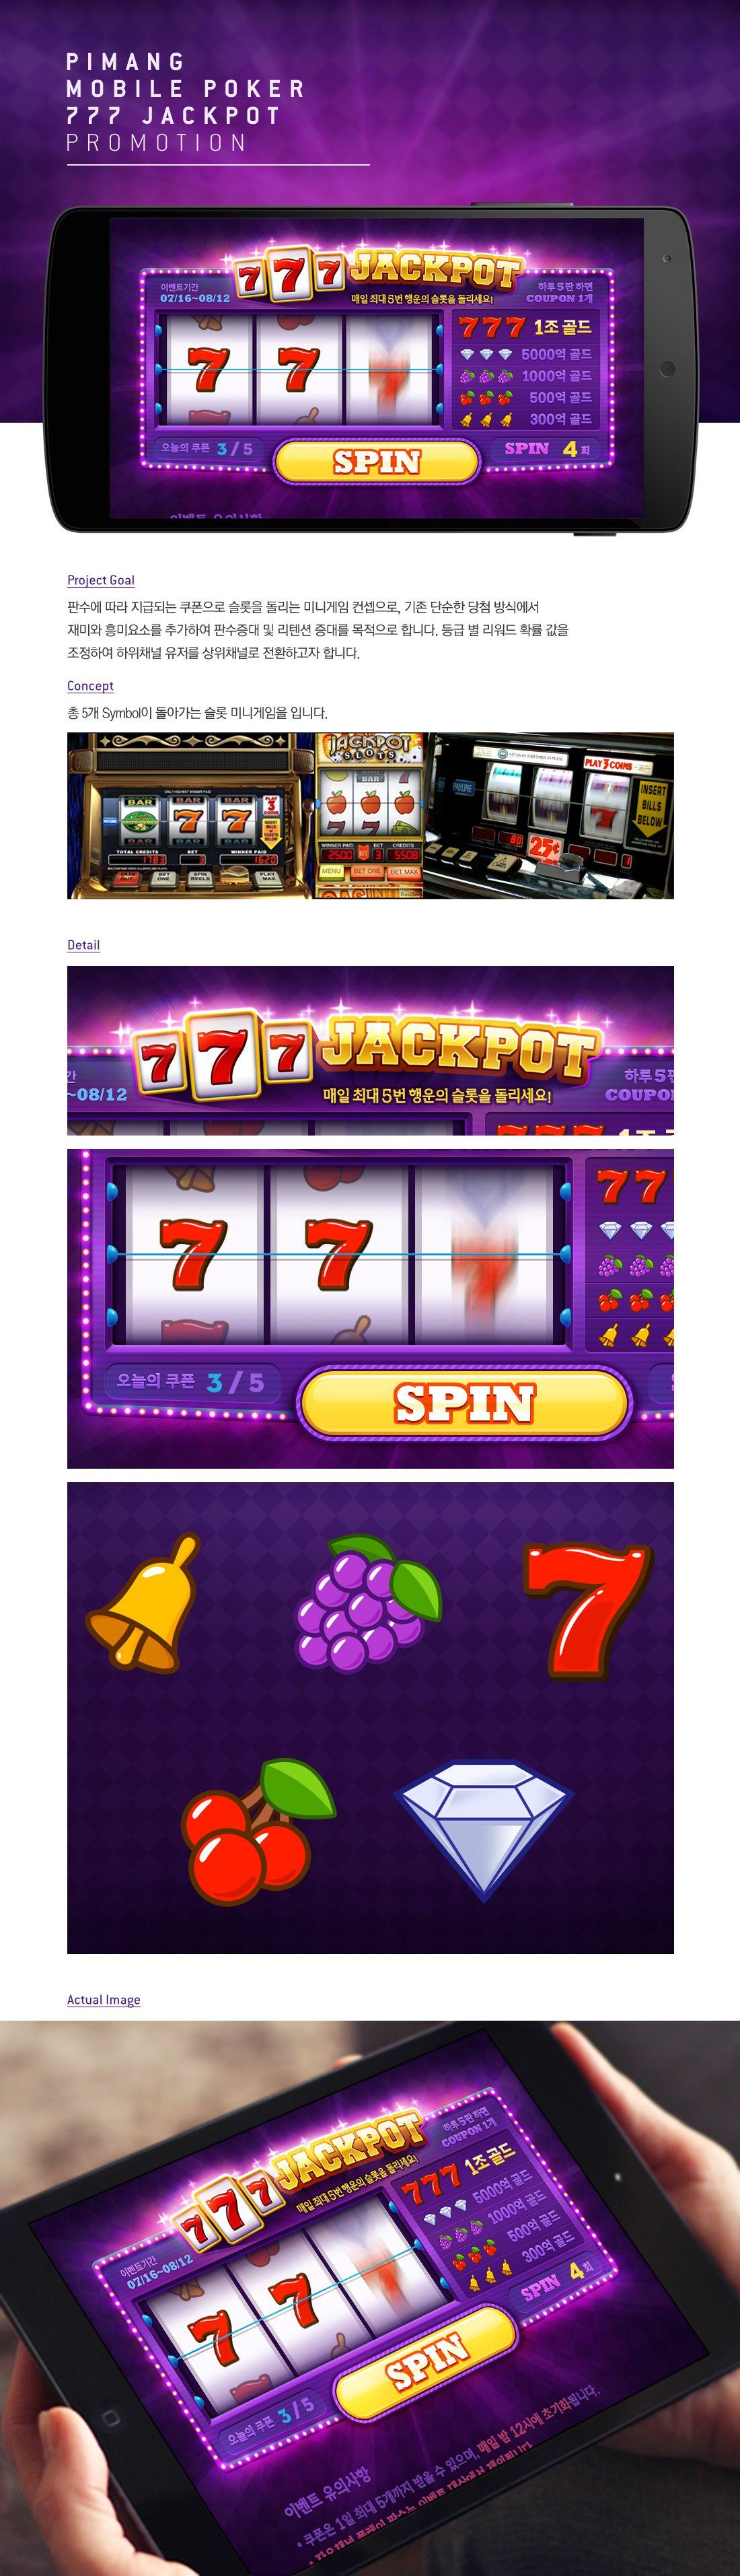 Poker 777 Jackpot slot Promotion on Behance 포커, 슬롯 머신, 프로모션